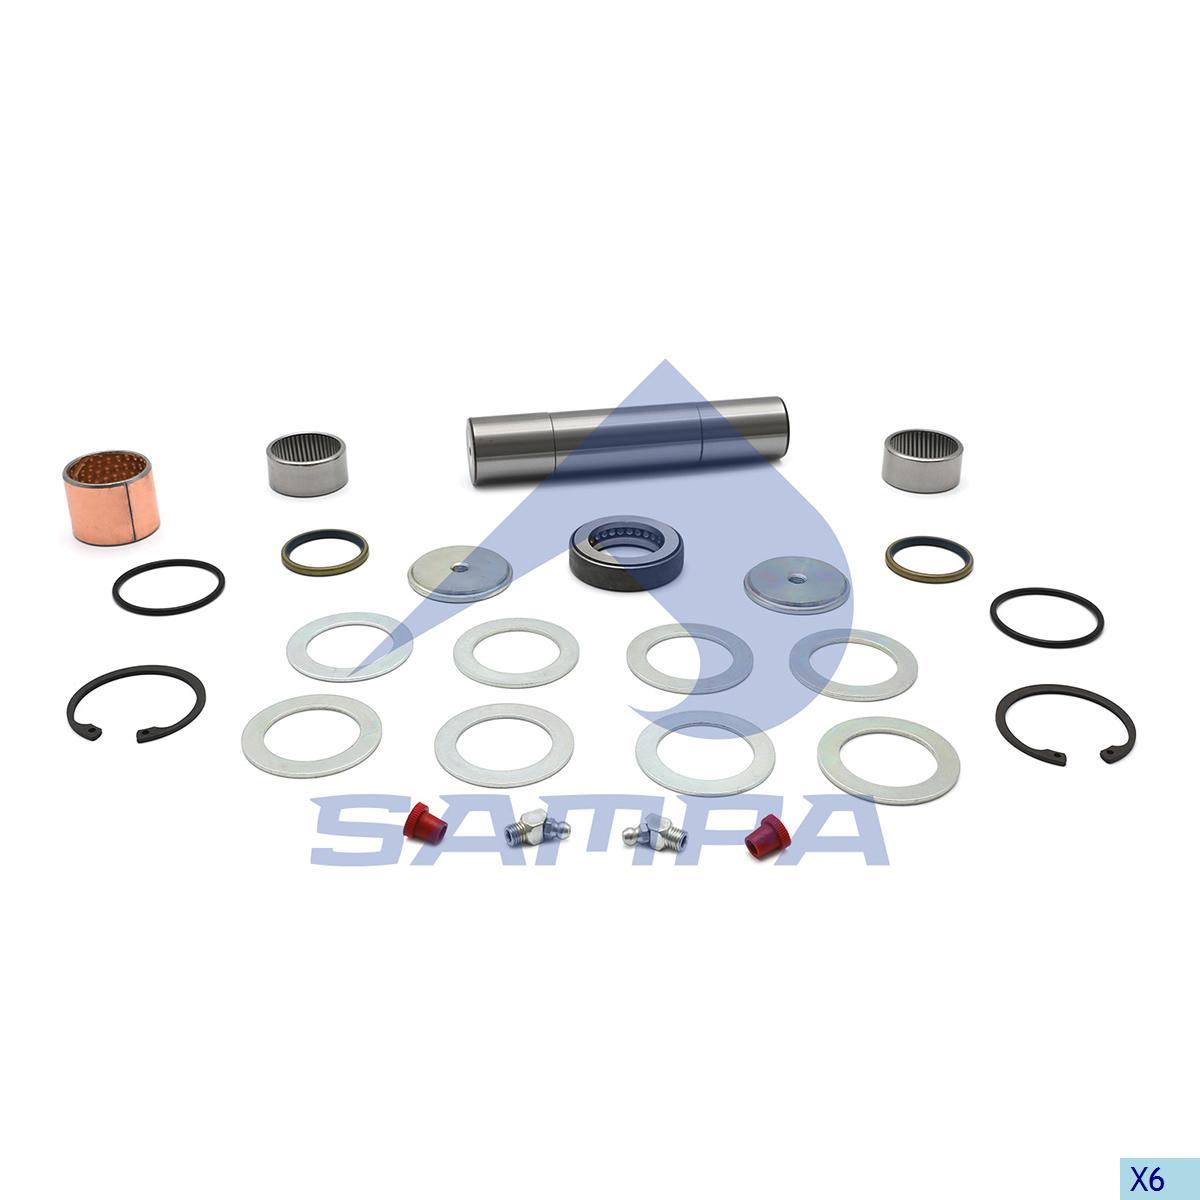 King Pin Kit, Axle Steering Knuckle, Man, Power Unit